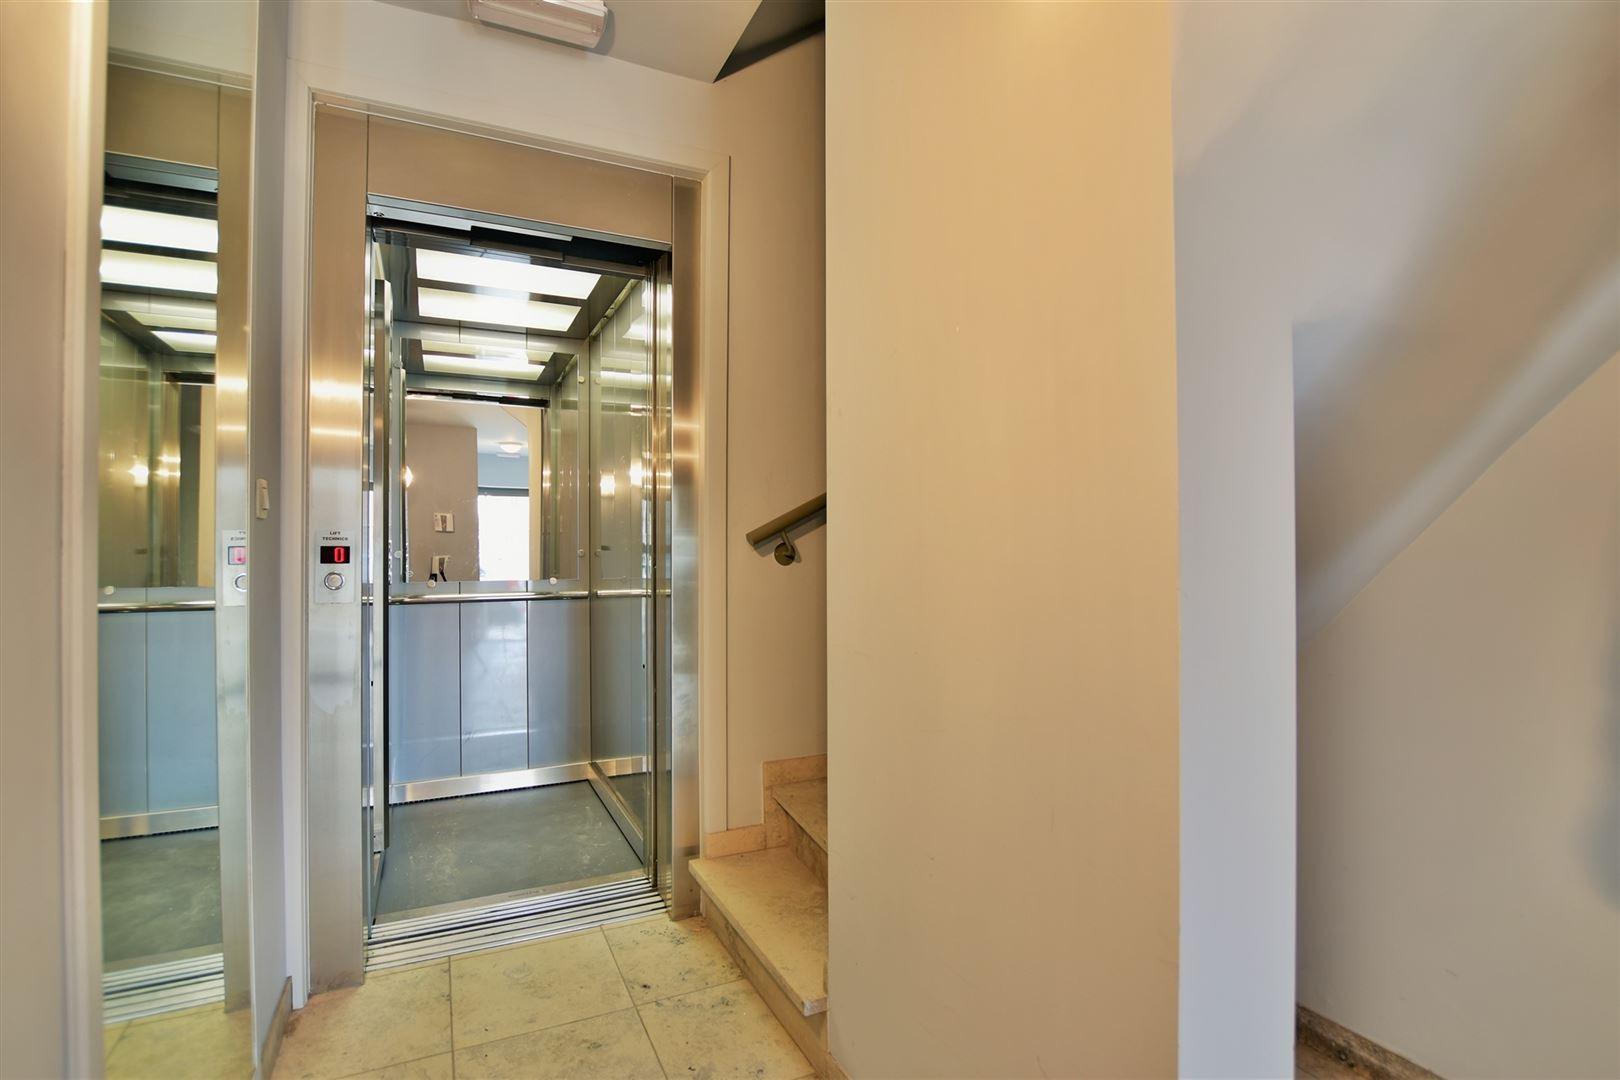 Foto 28 : Duplex/Penthouse te 9200 Sint-Gillis-bij-Dendermonde (België) - Prijs € 278.000